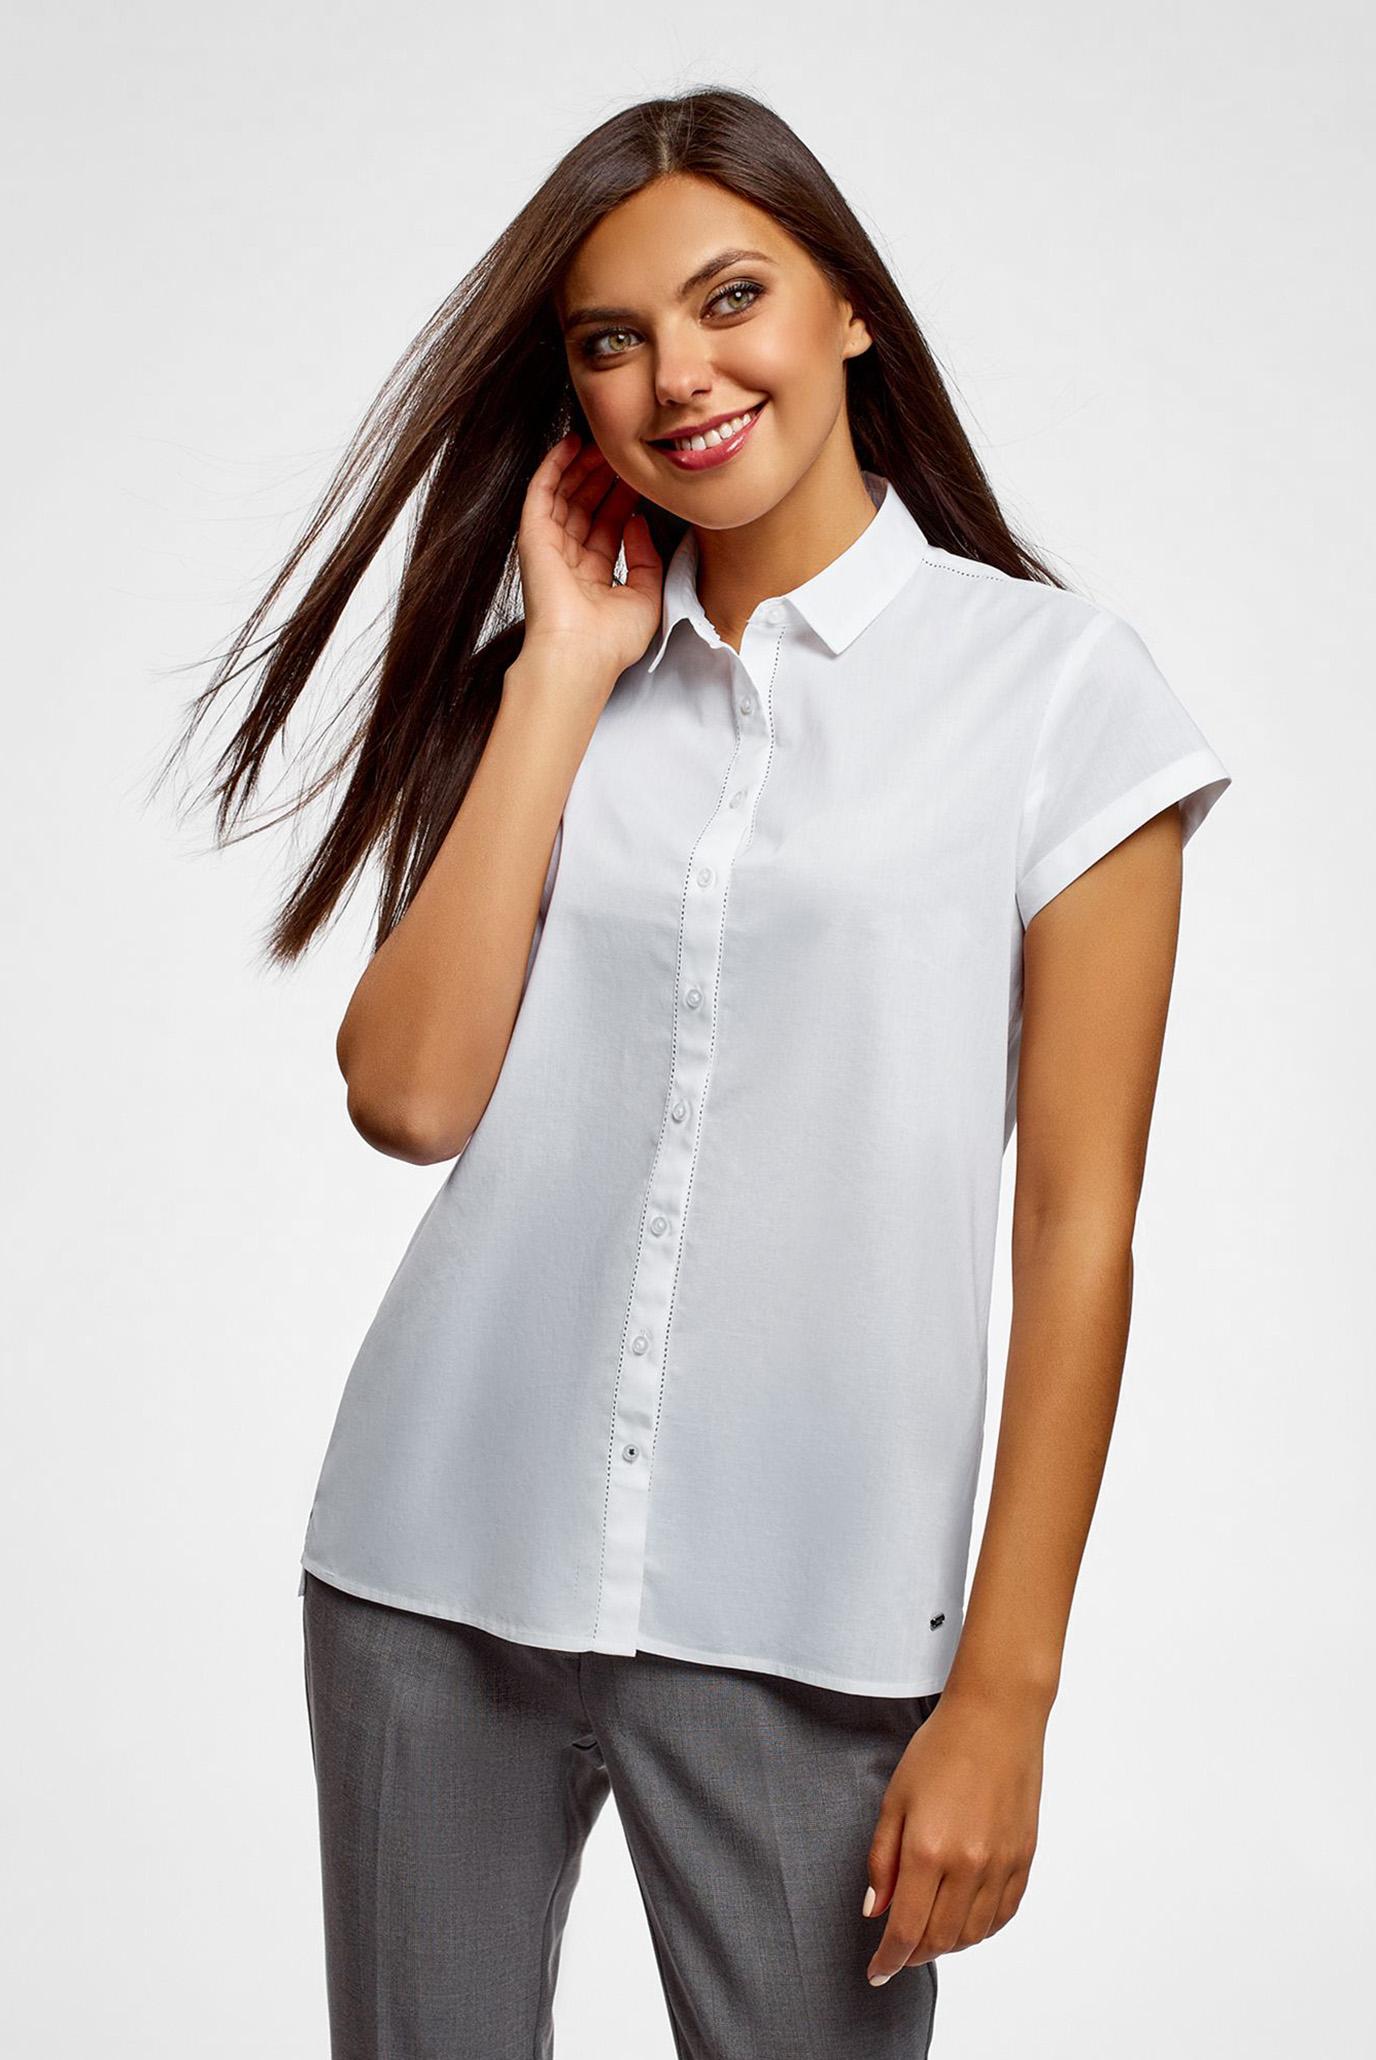 b24d8930ed9df39 Купить Женская белая рубашка Oodji Oodji 13K11001/46401/1000N – Киев,  Украина. Цены в интернет магазине MD Fashion